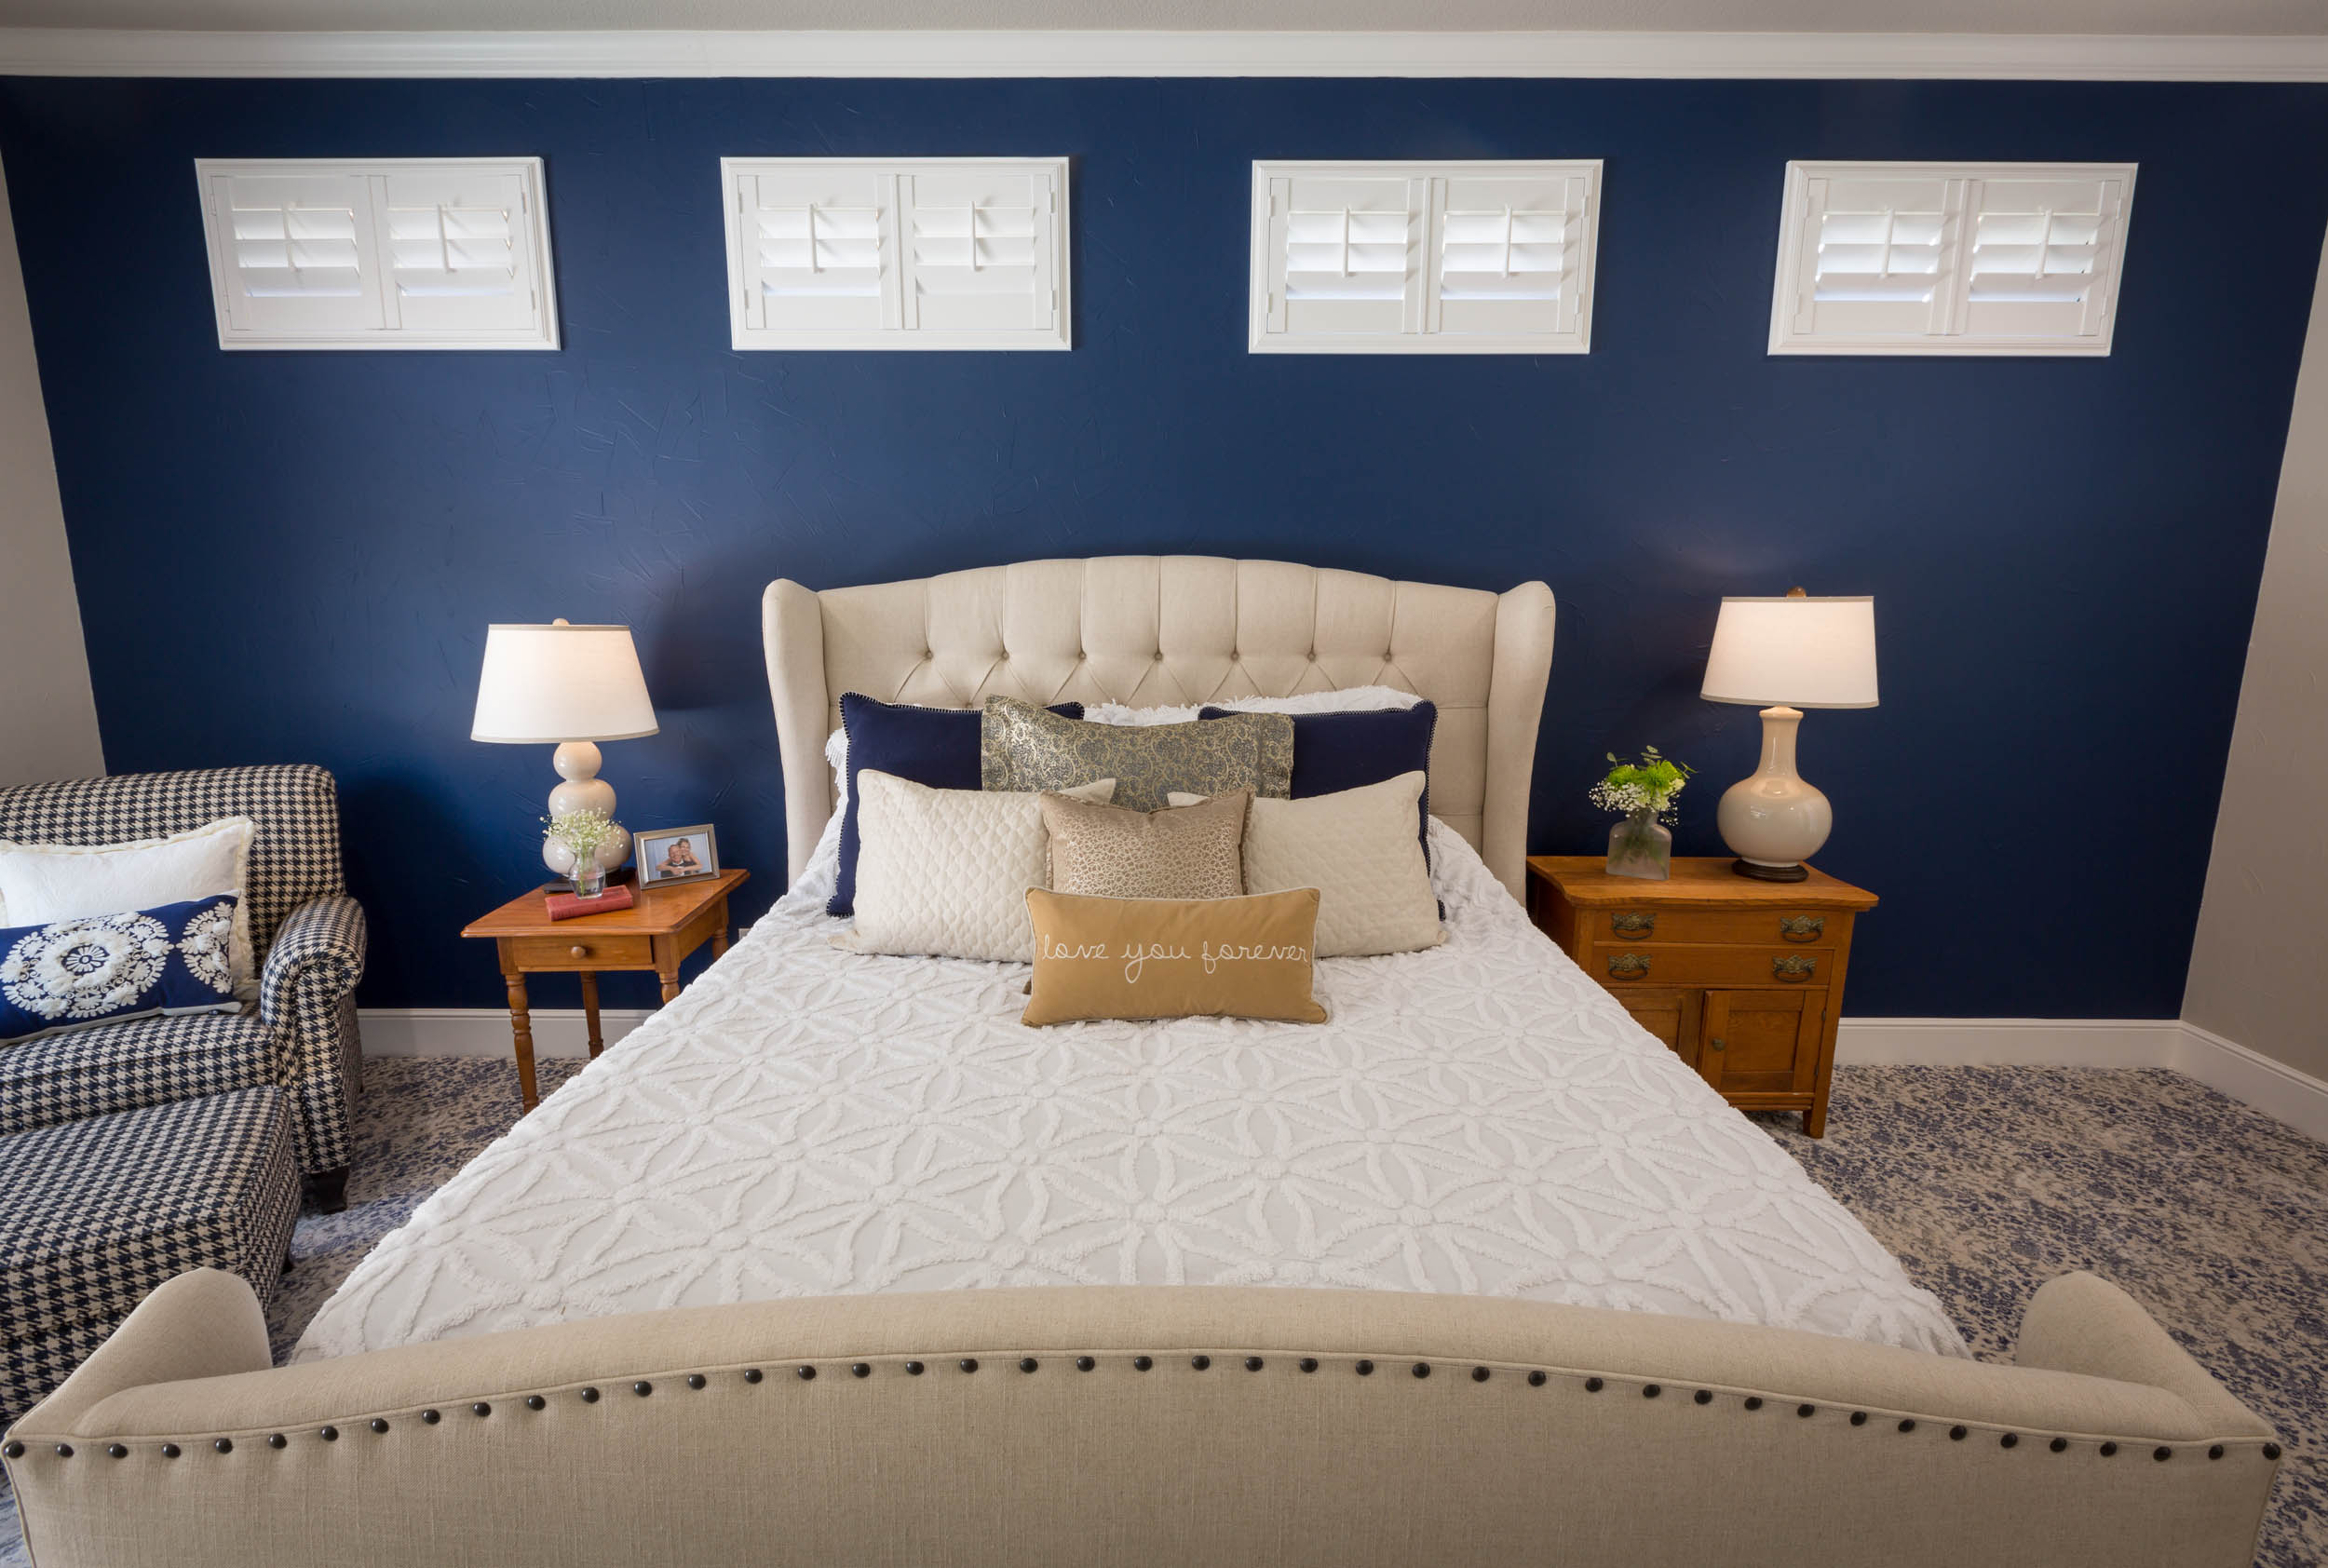 Bedroom redesign interior home improvement for return on enjoyment